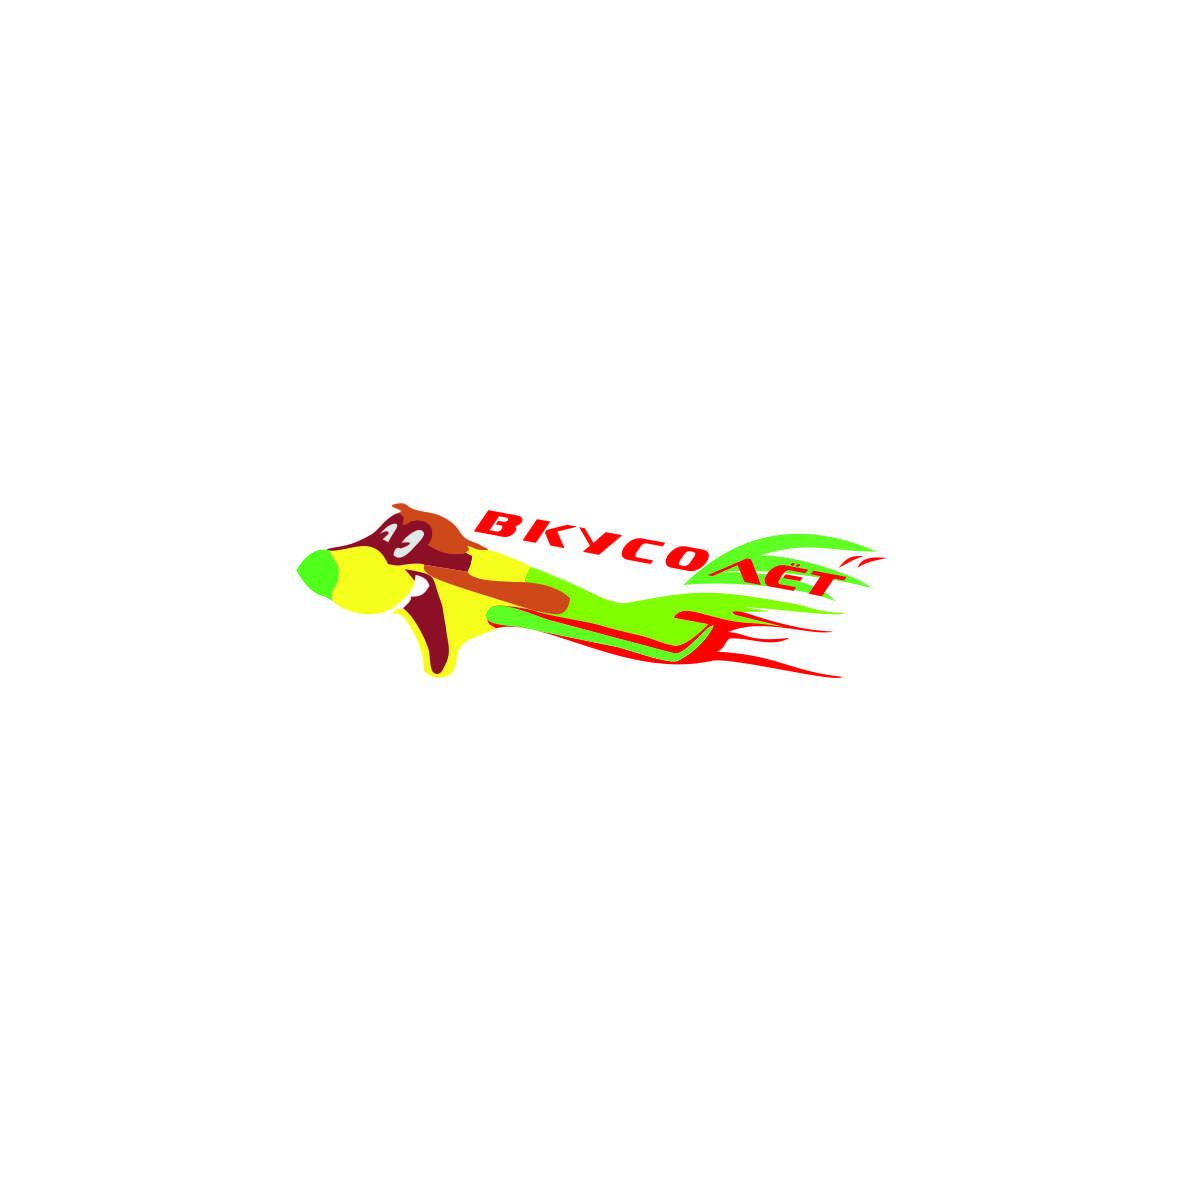 Логотип для доставки еды фото f_07859d4a2a730508.jpg